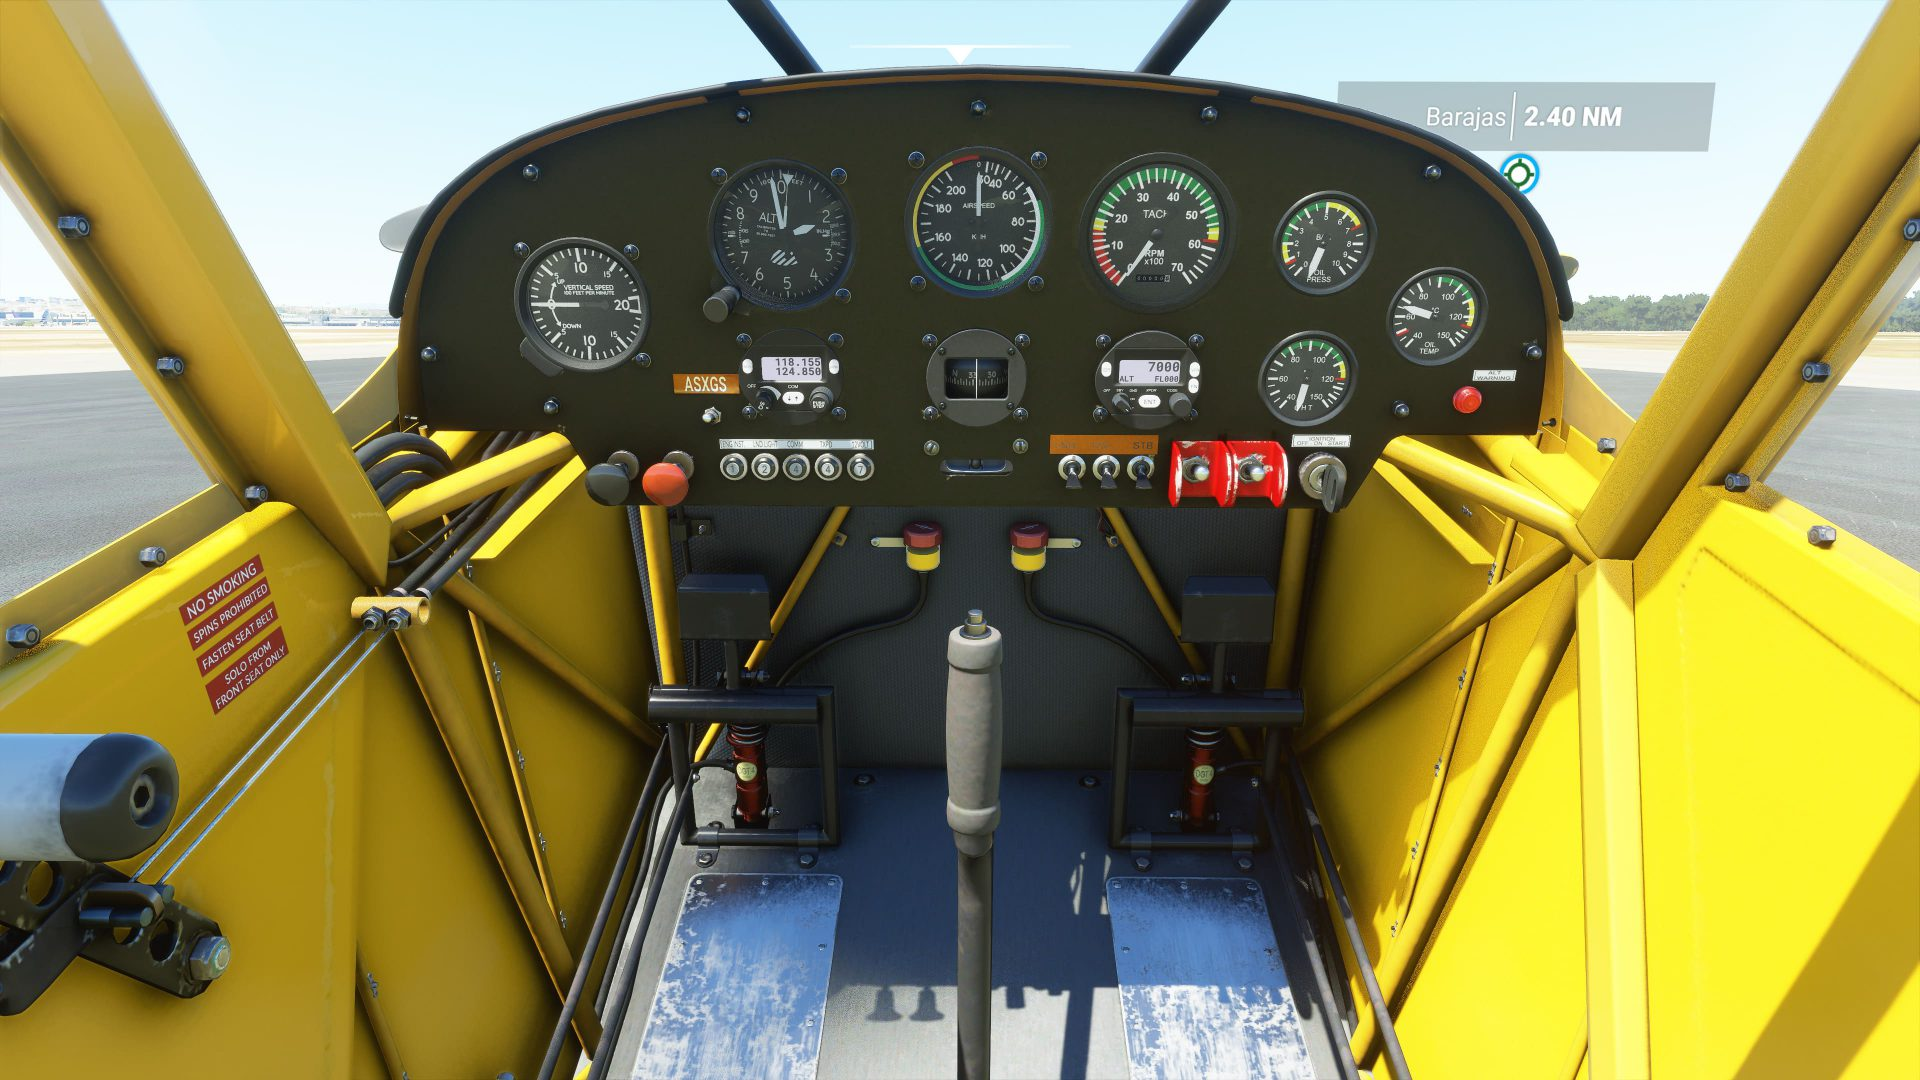 Mandos de una avioneta de Microsoft Flight Simulator